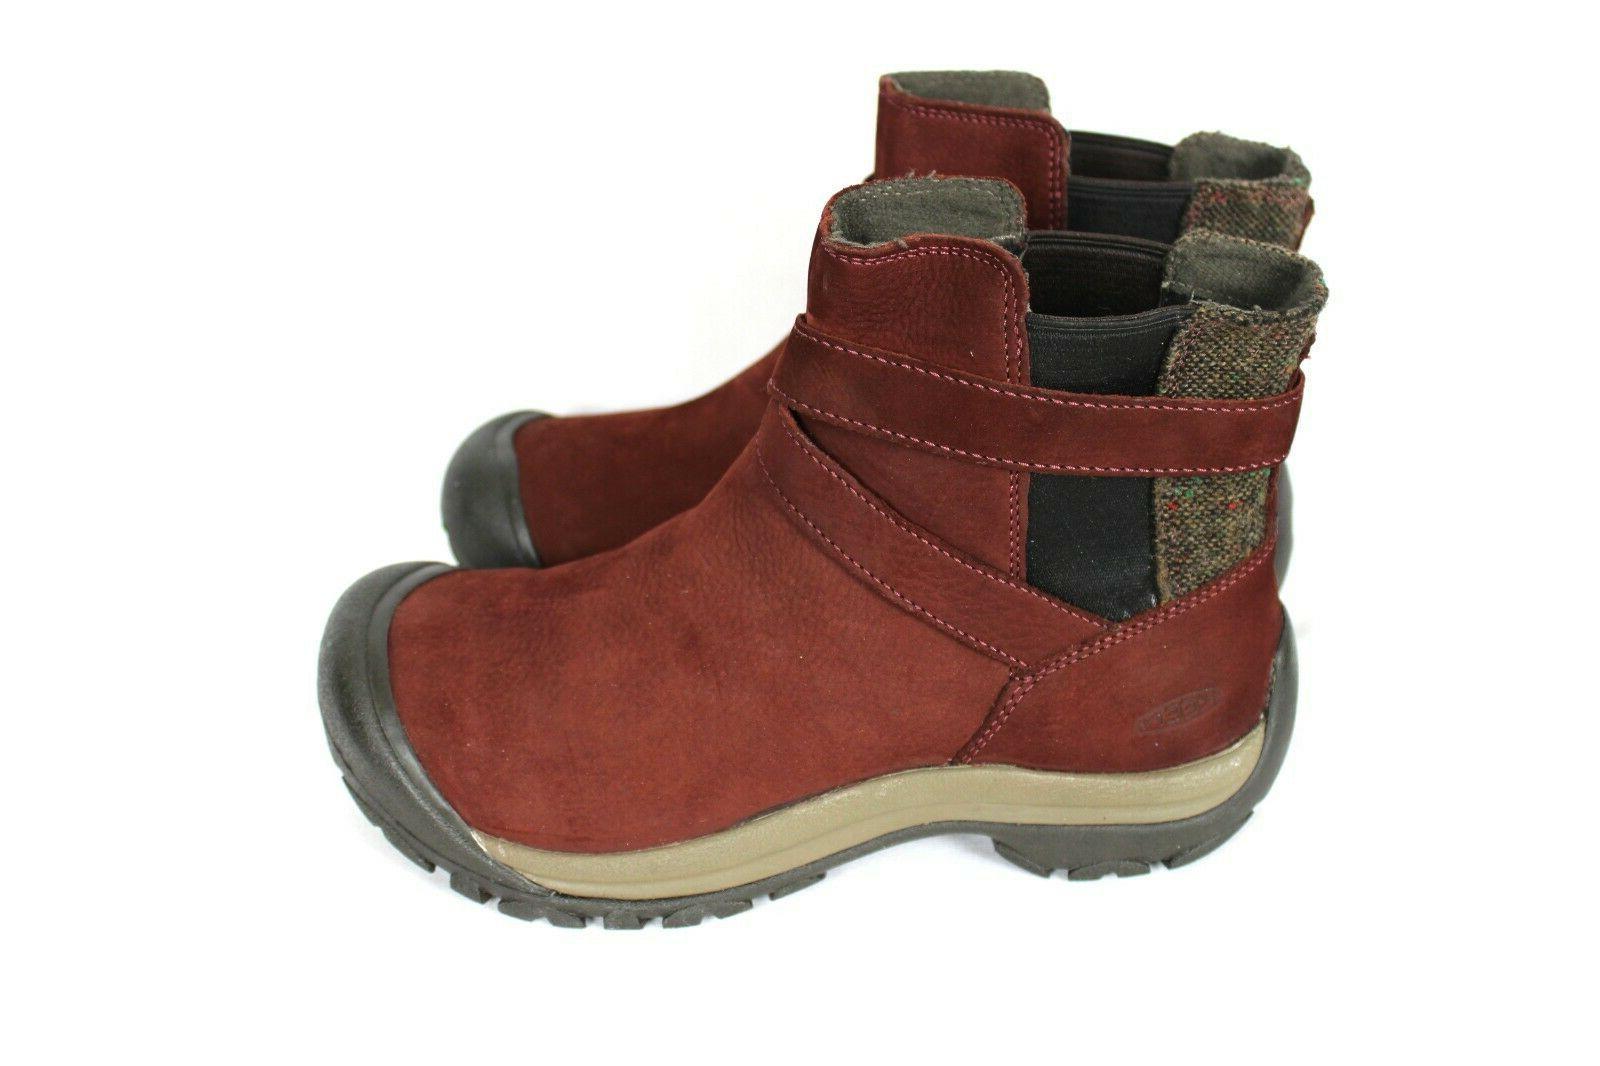 Keen Womens Maroon On Boots 8.5 10 -